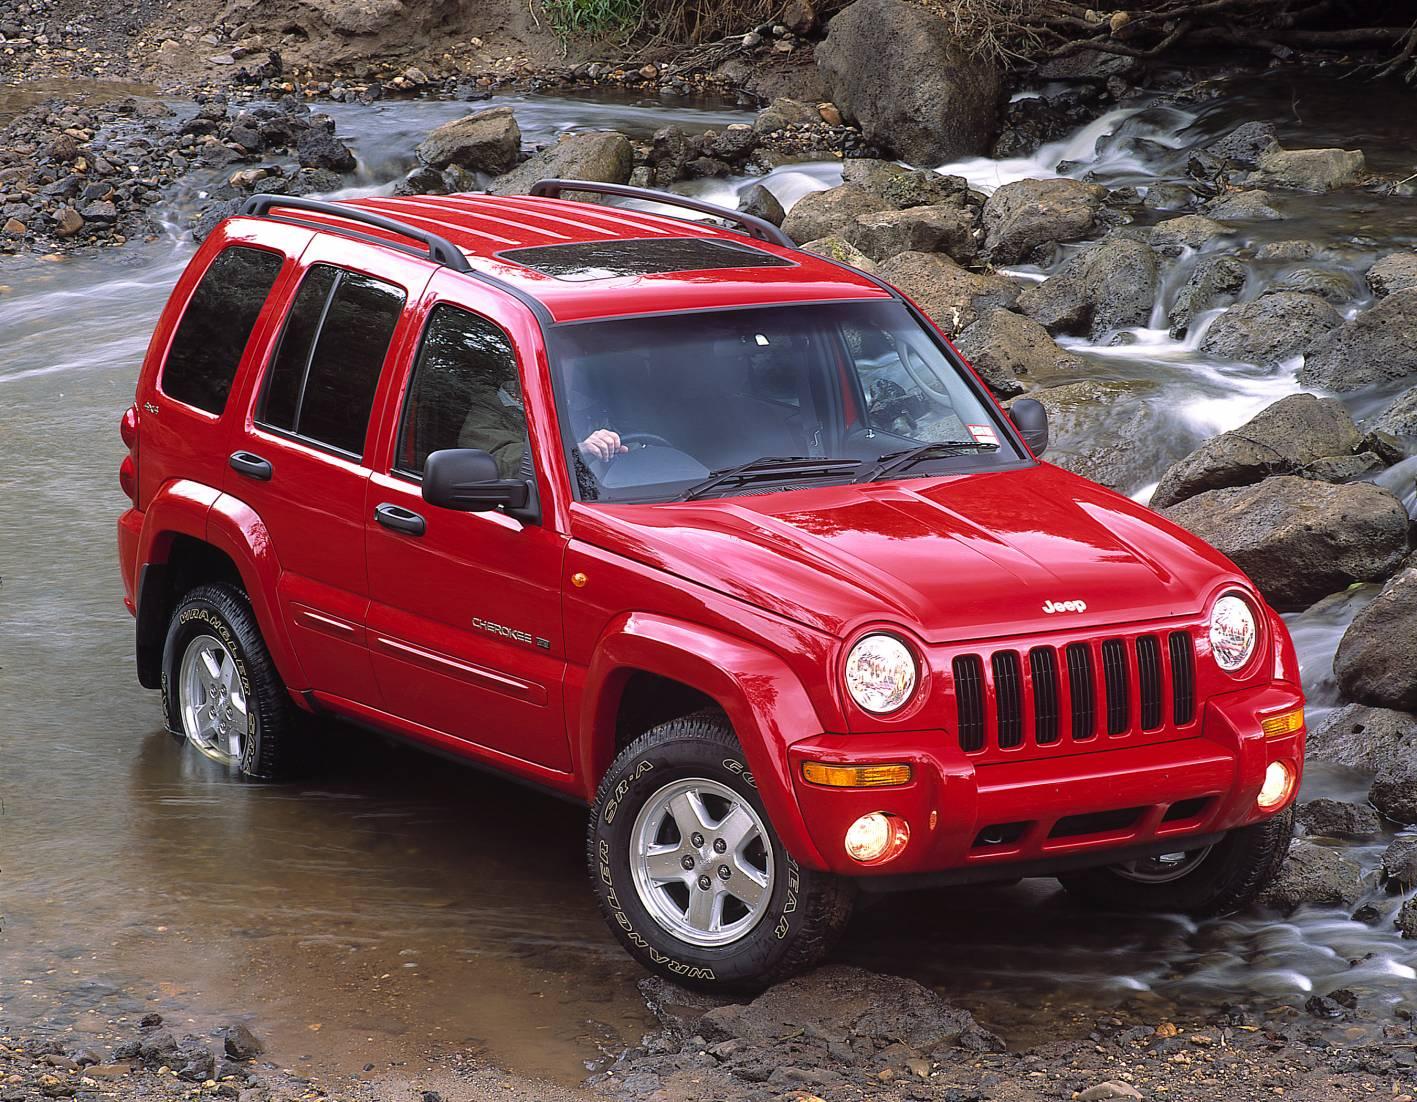 2009 jeep cherokee.jpg